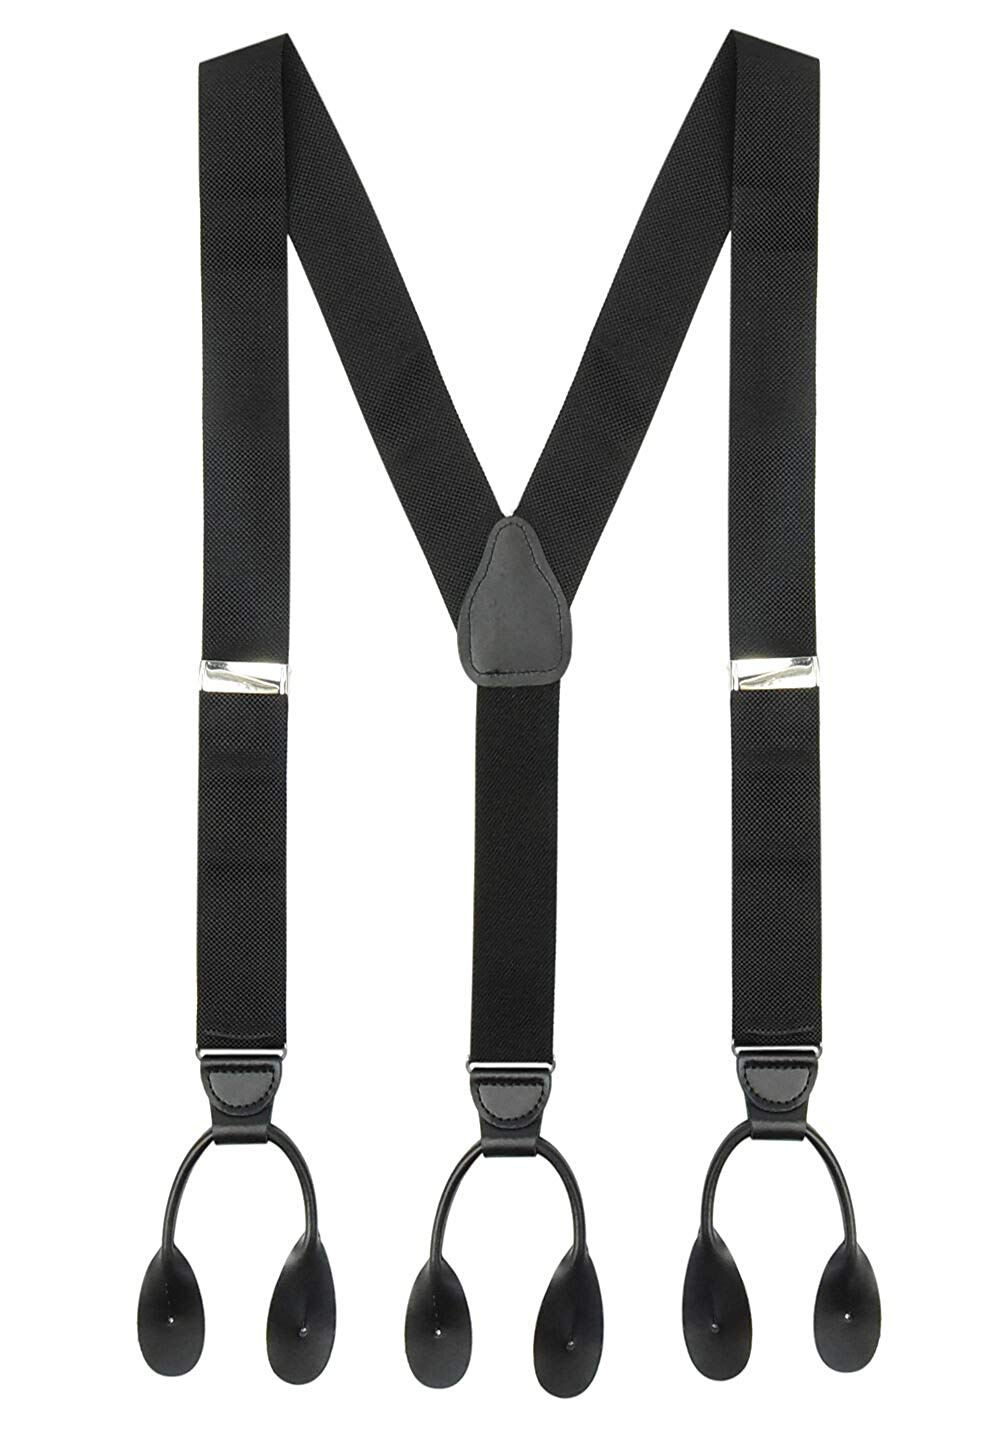 CUSTOM LEATHERCRAFT Work Suspenders,No 110BLU 3PK